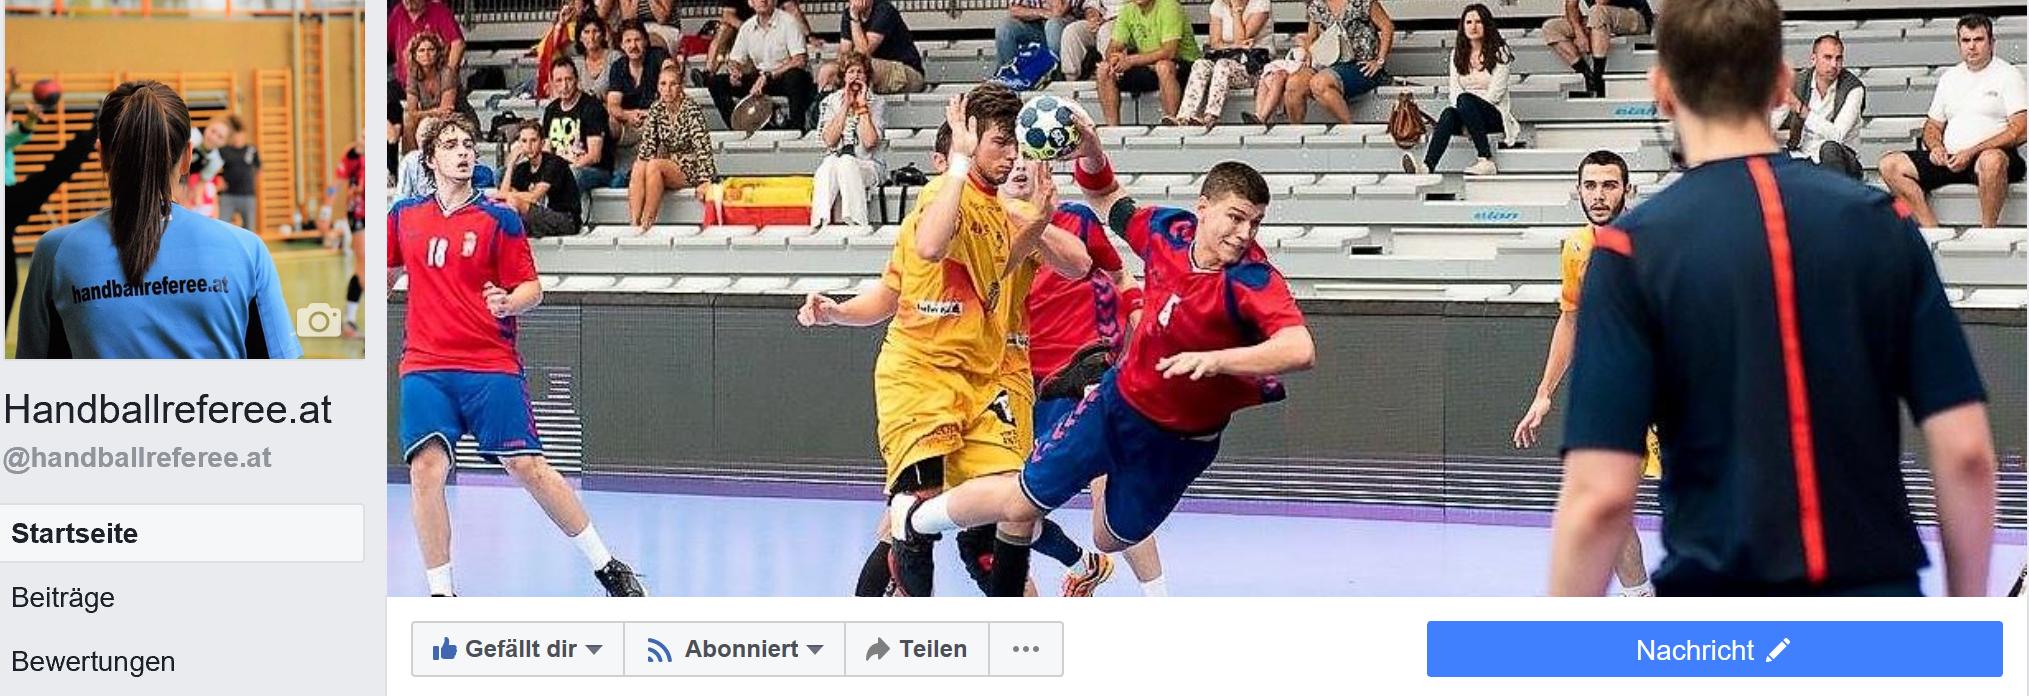 Like! handballreferee.at jetzt auch auf Facebook!